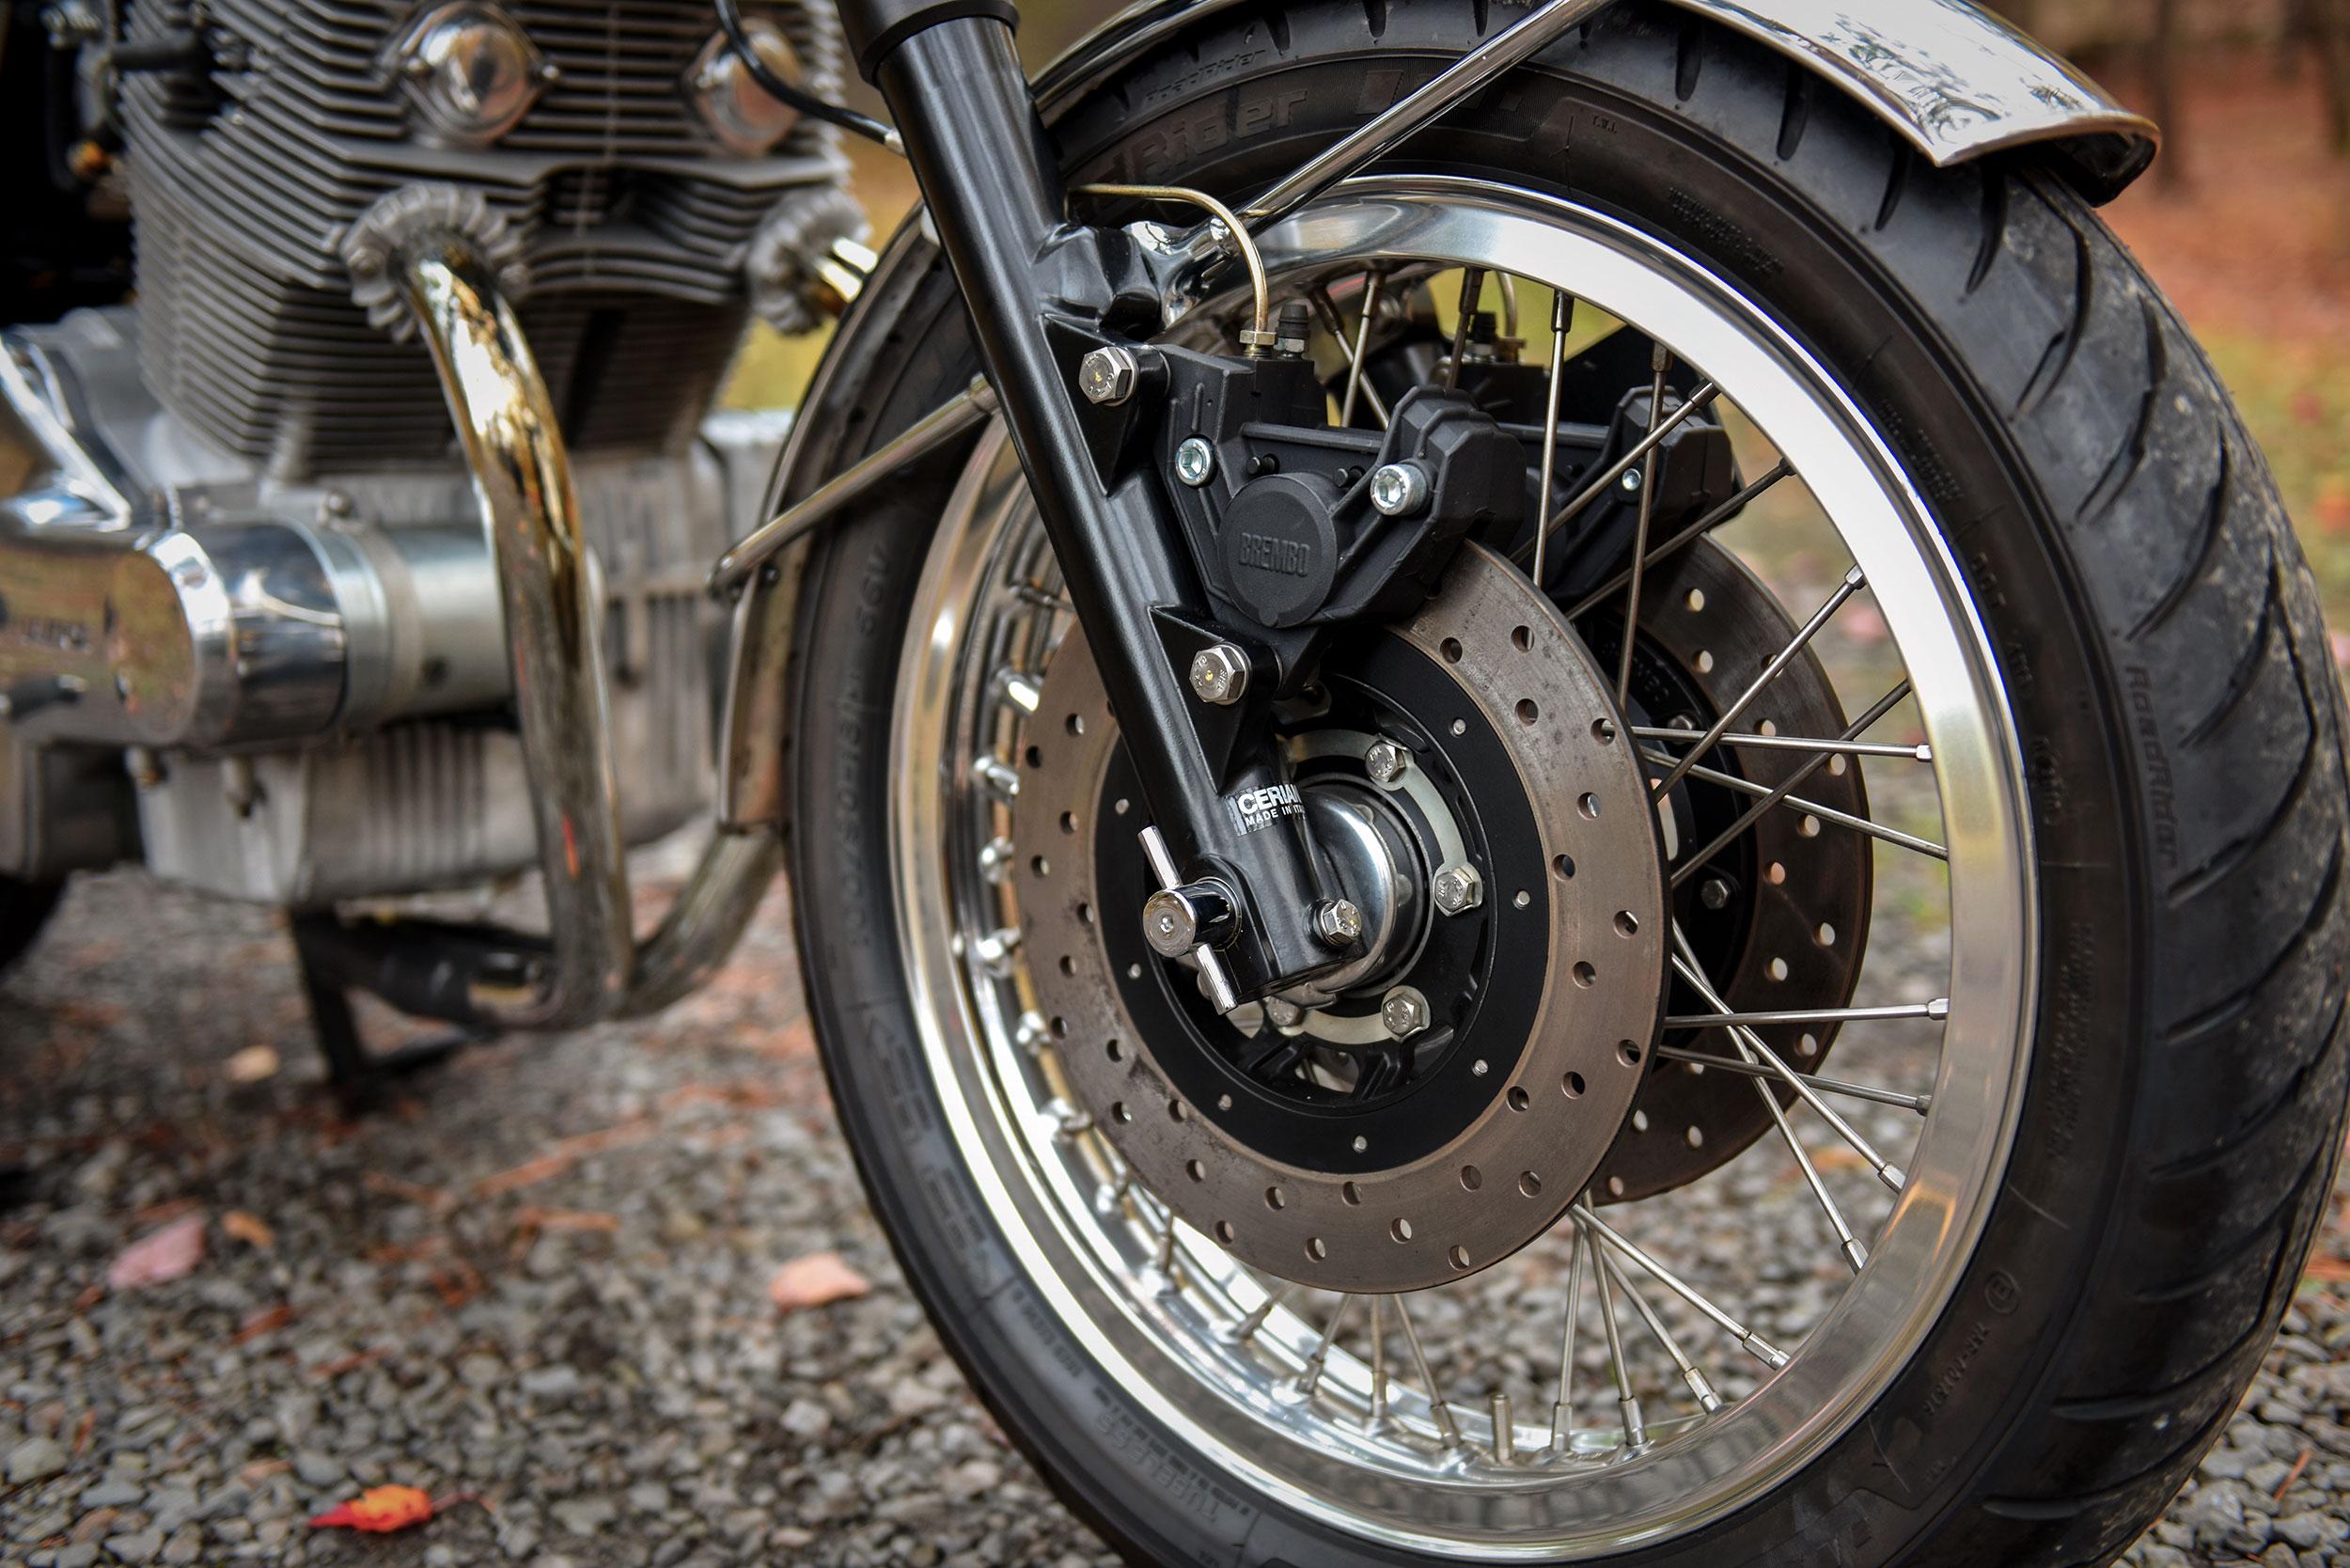 Laverda SFC 2 Custom Motorcycle Moto Borgotaro Breaks